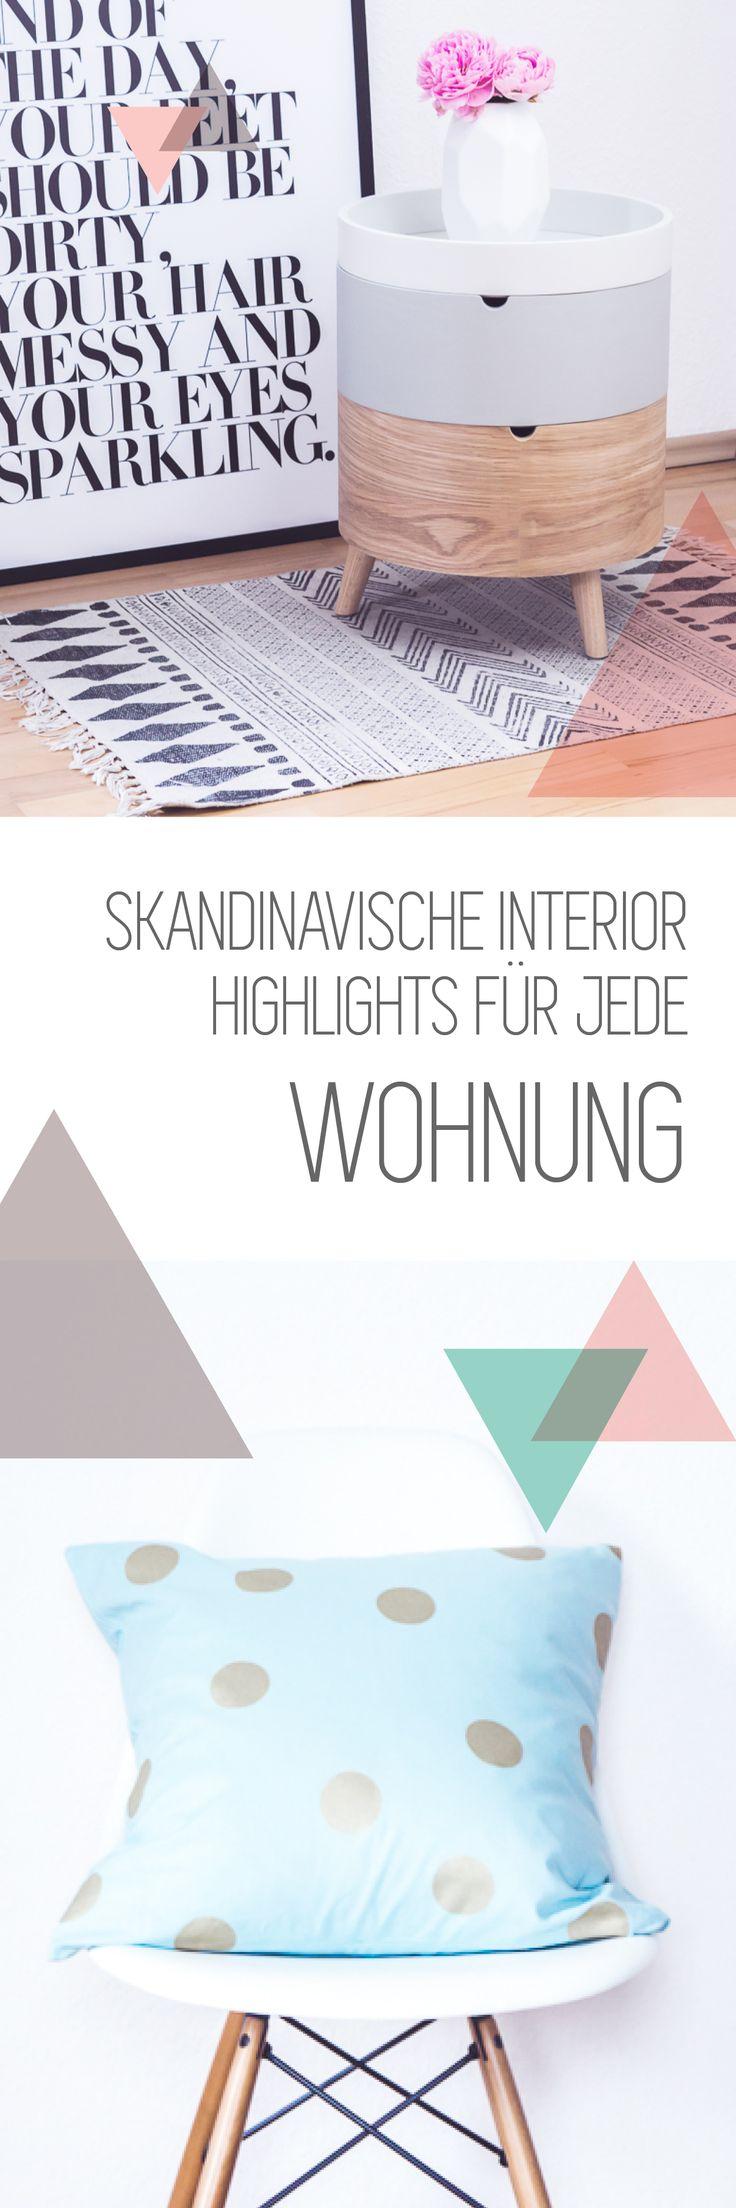 25 best Wohnzimmer images on Pinterest | Boho looks, Simple living ...